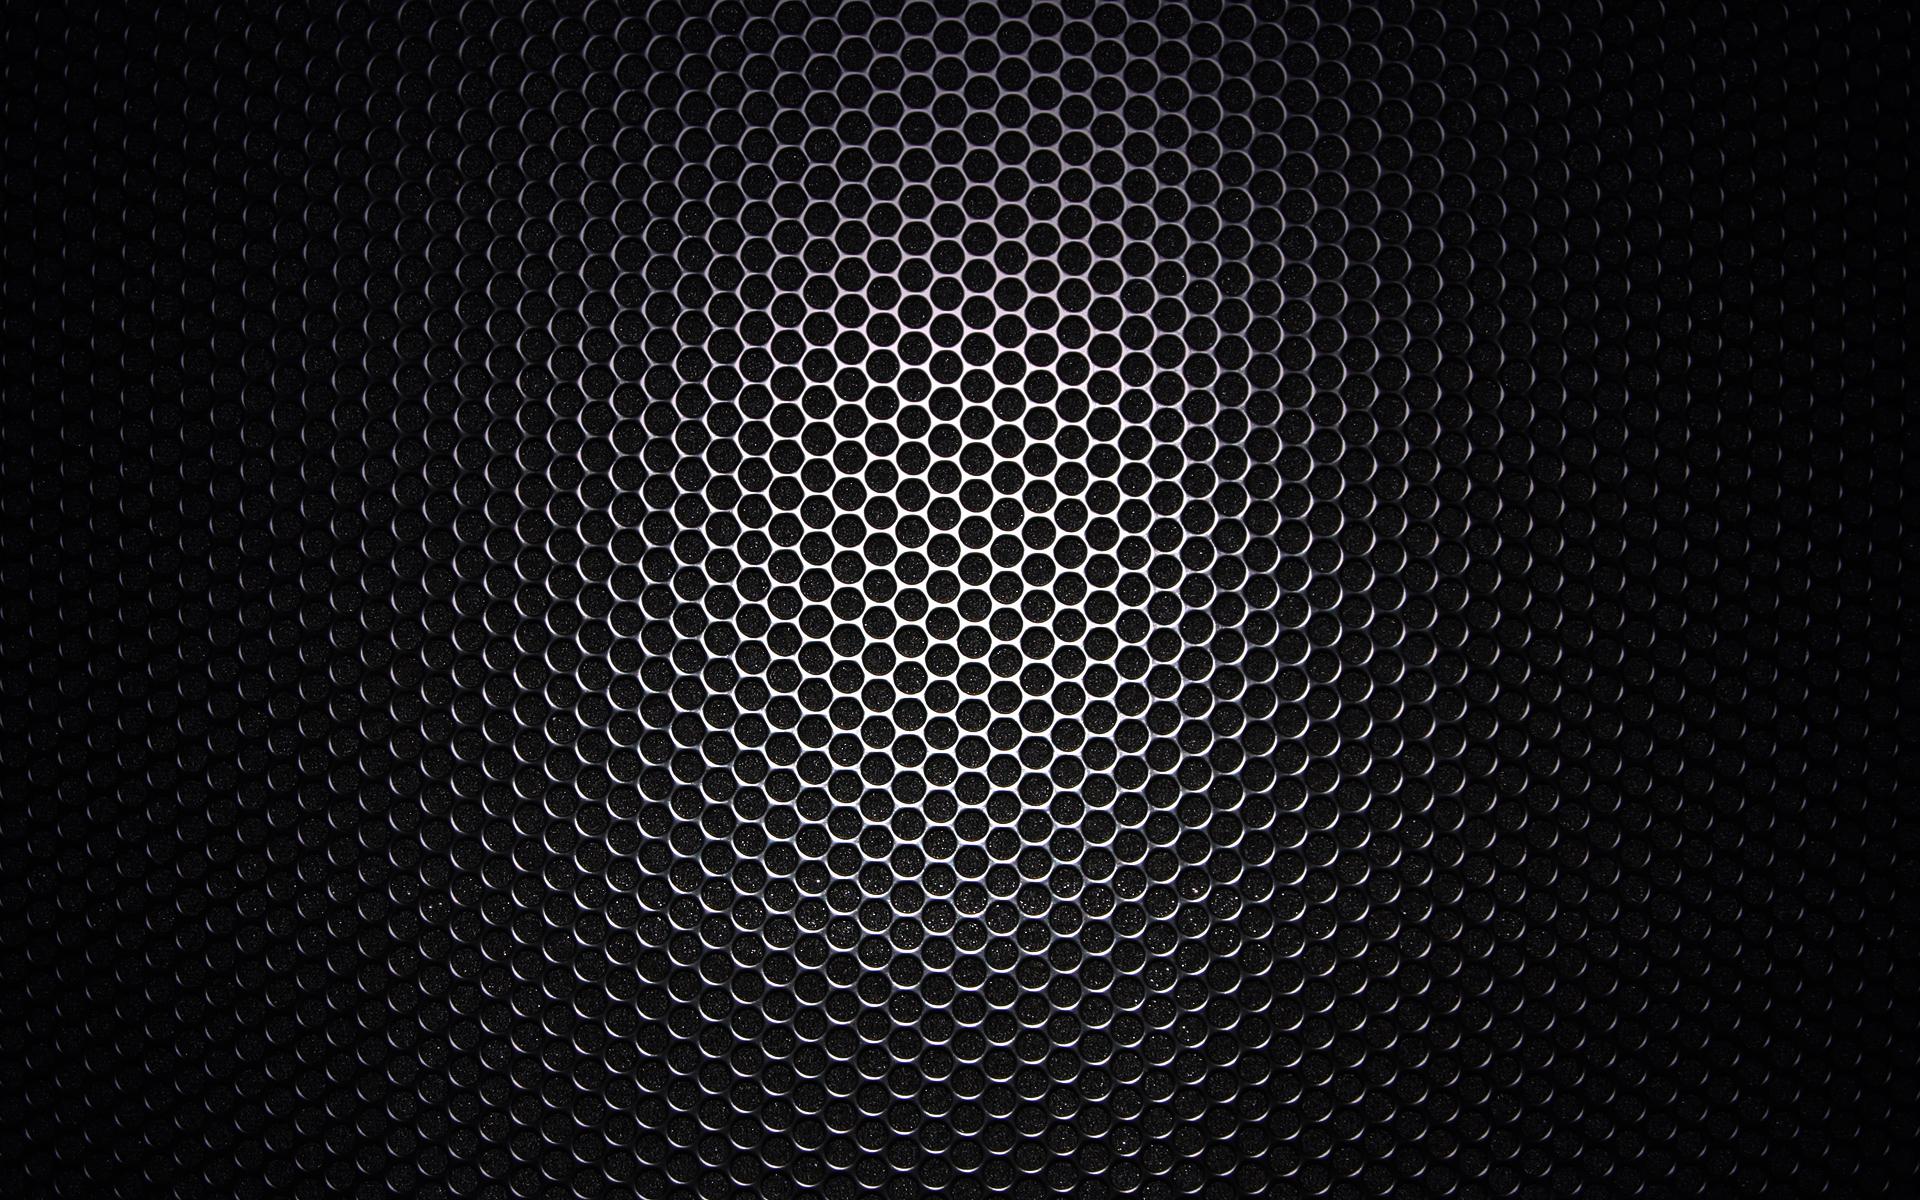 Background image jpg - Jpeg 1920x1200 Background Sound